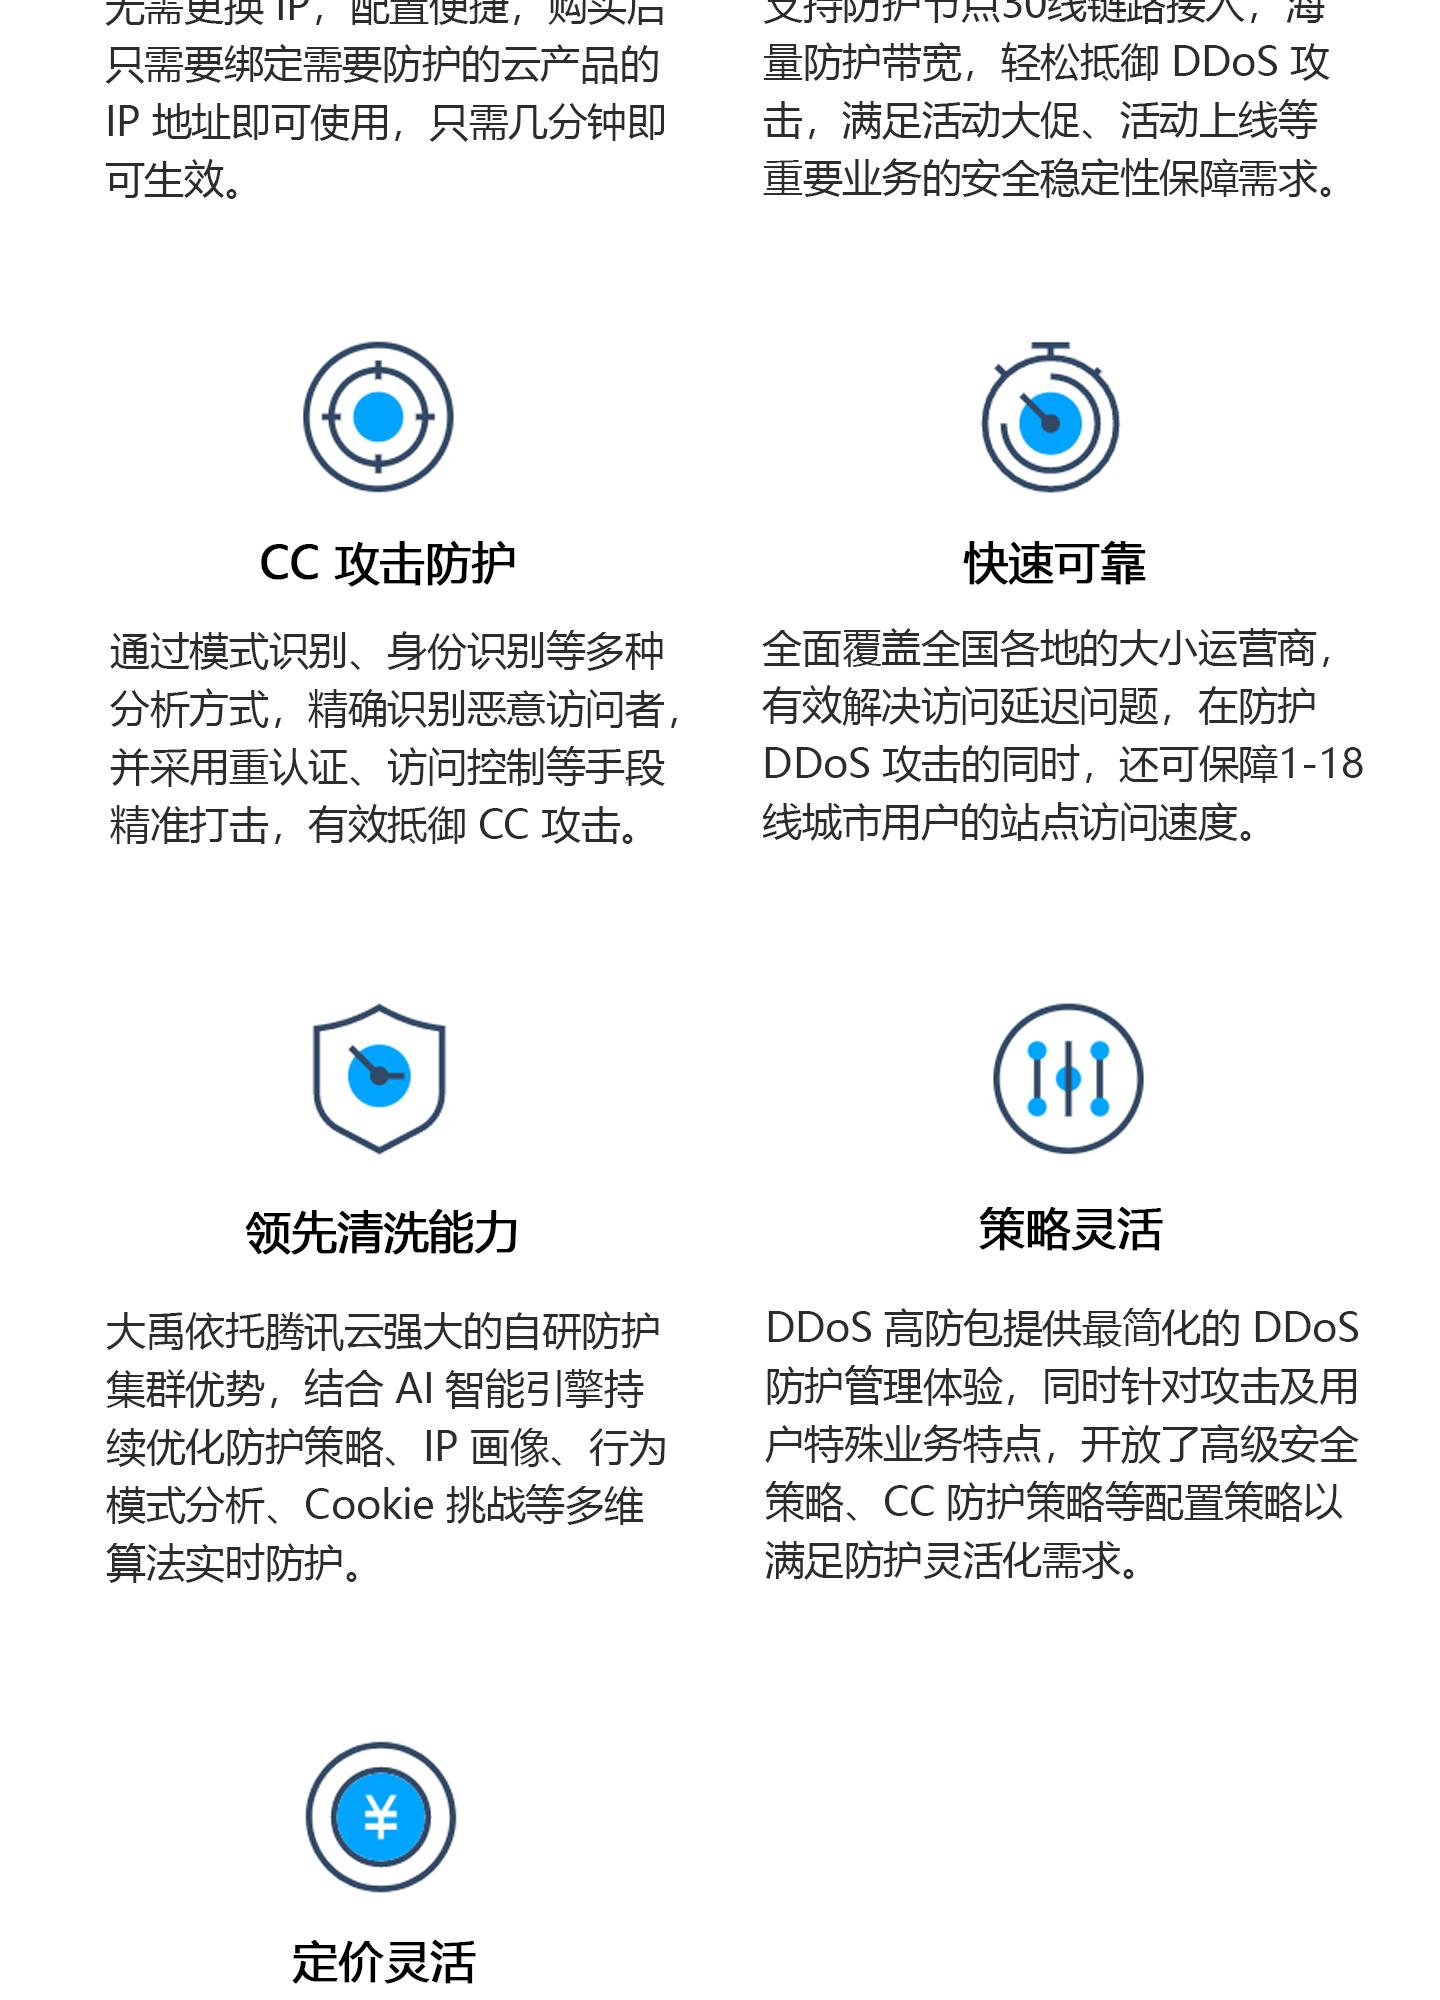 T-Sec-DDoS-高防包1440_02.jpg